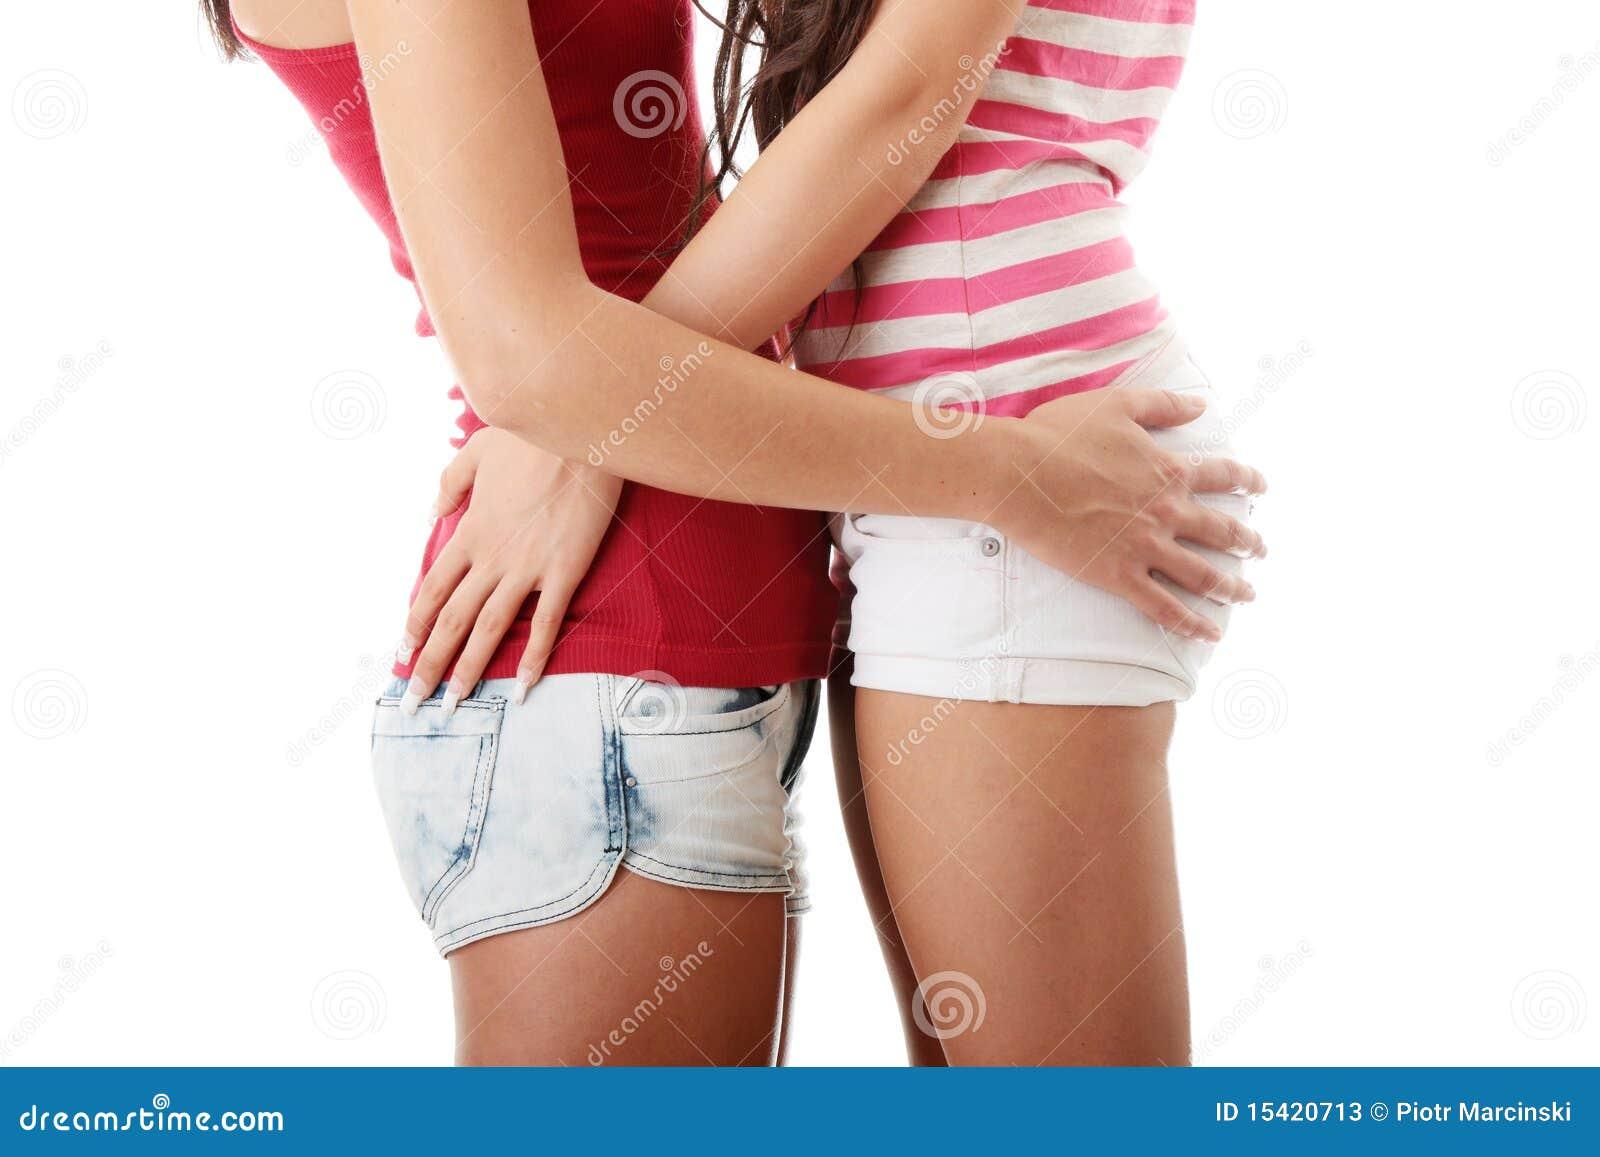 Storie di donne lesbiche-6741